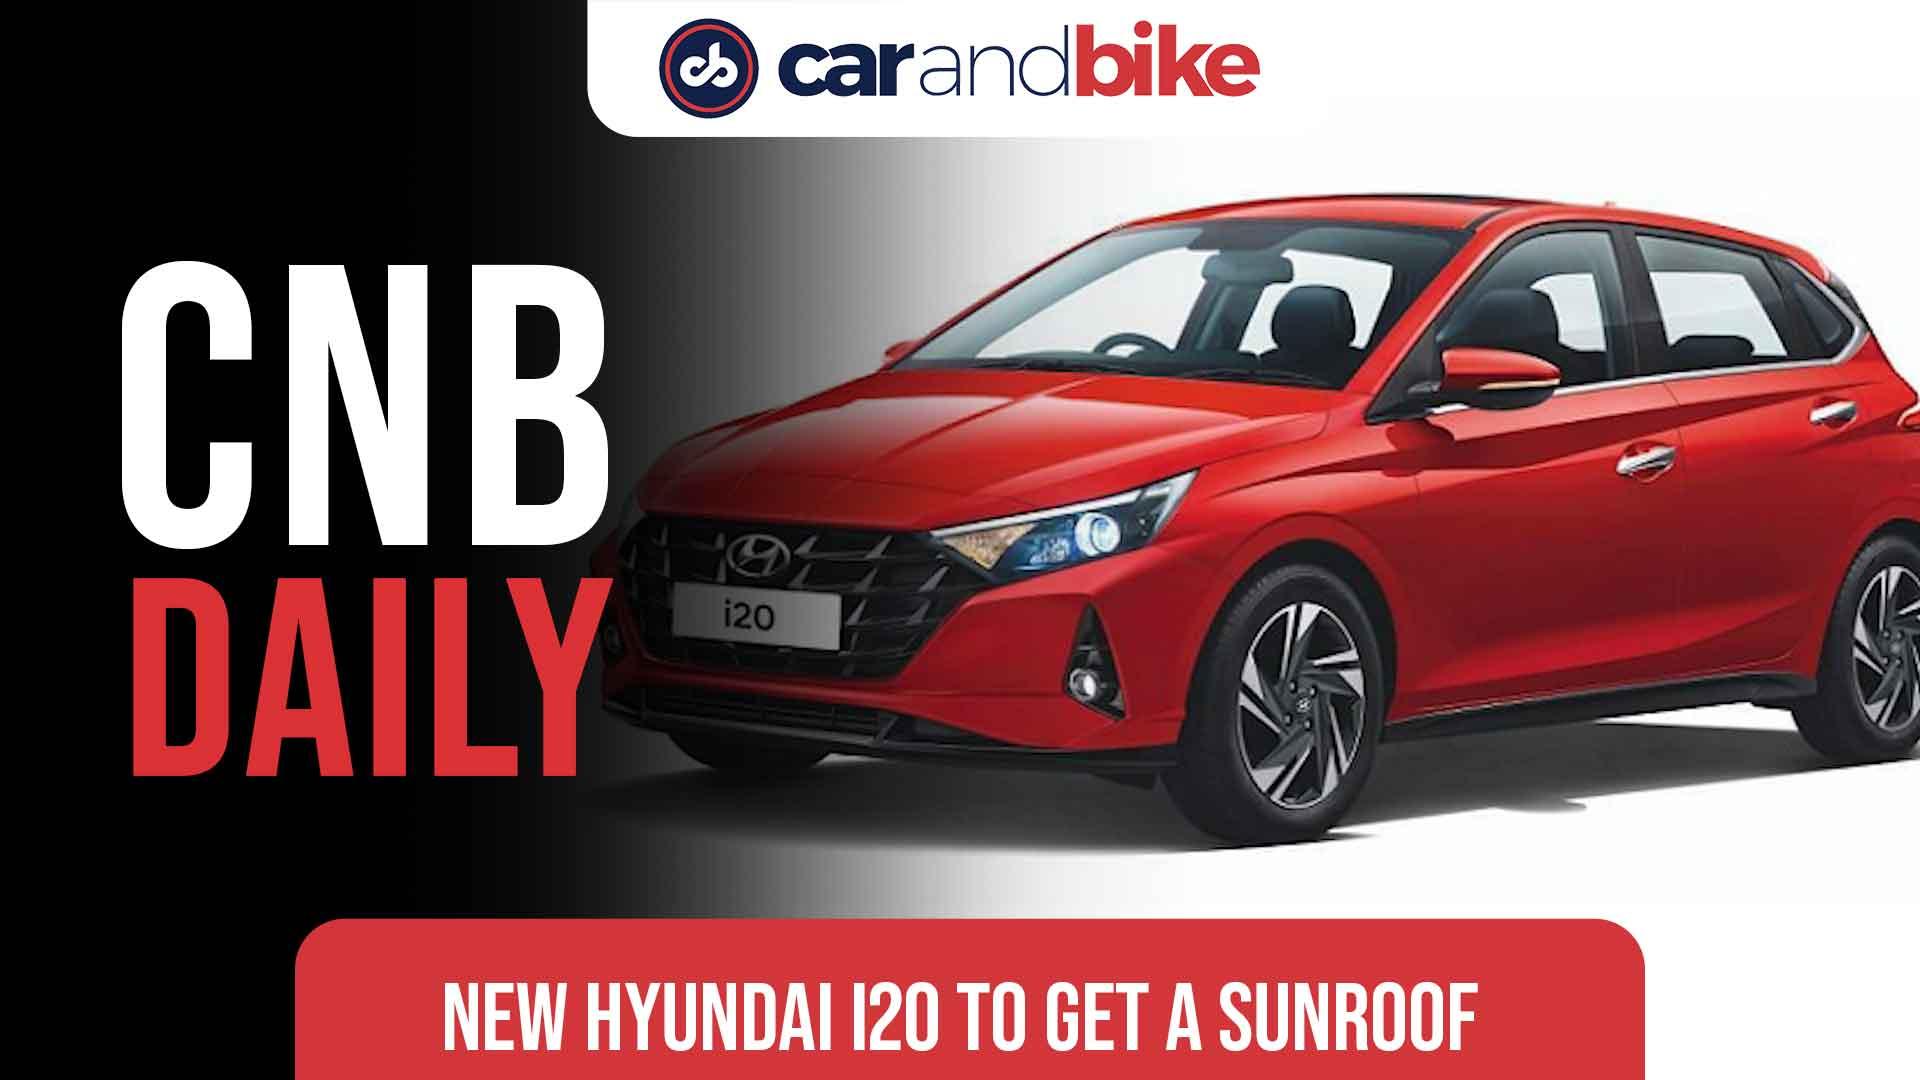 New Hyundai i20 To Get A Sunroof